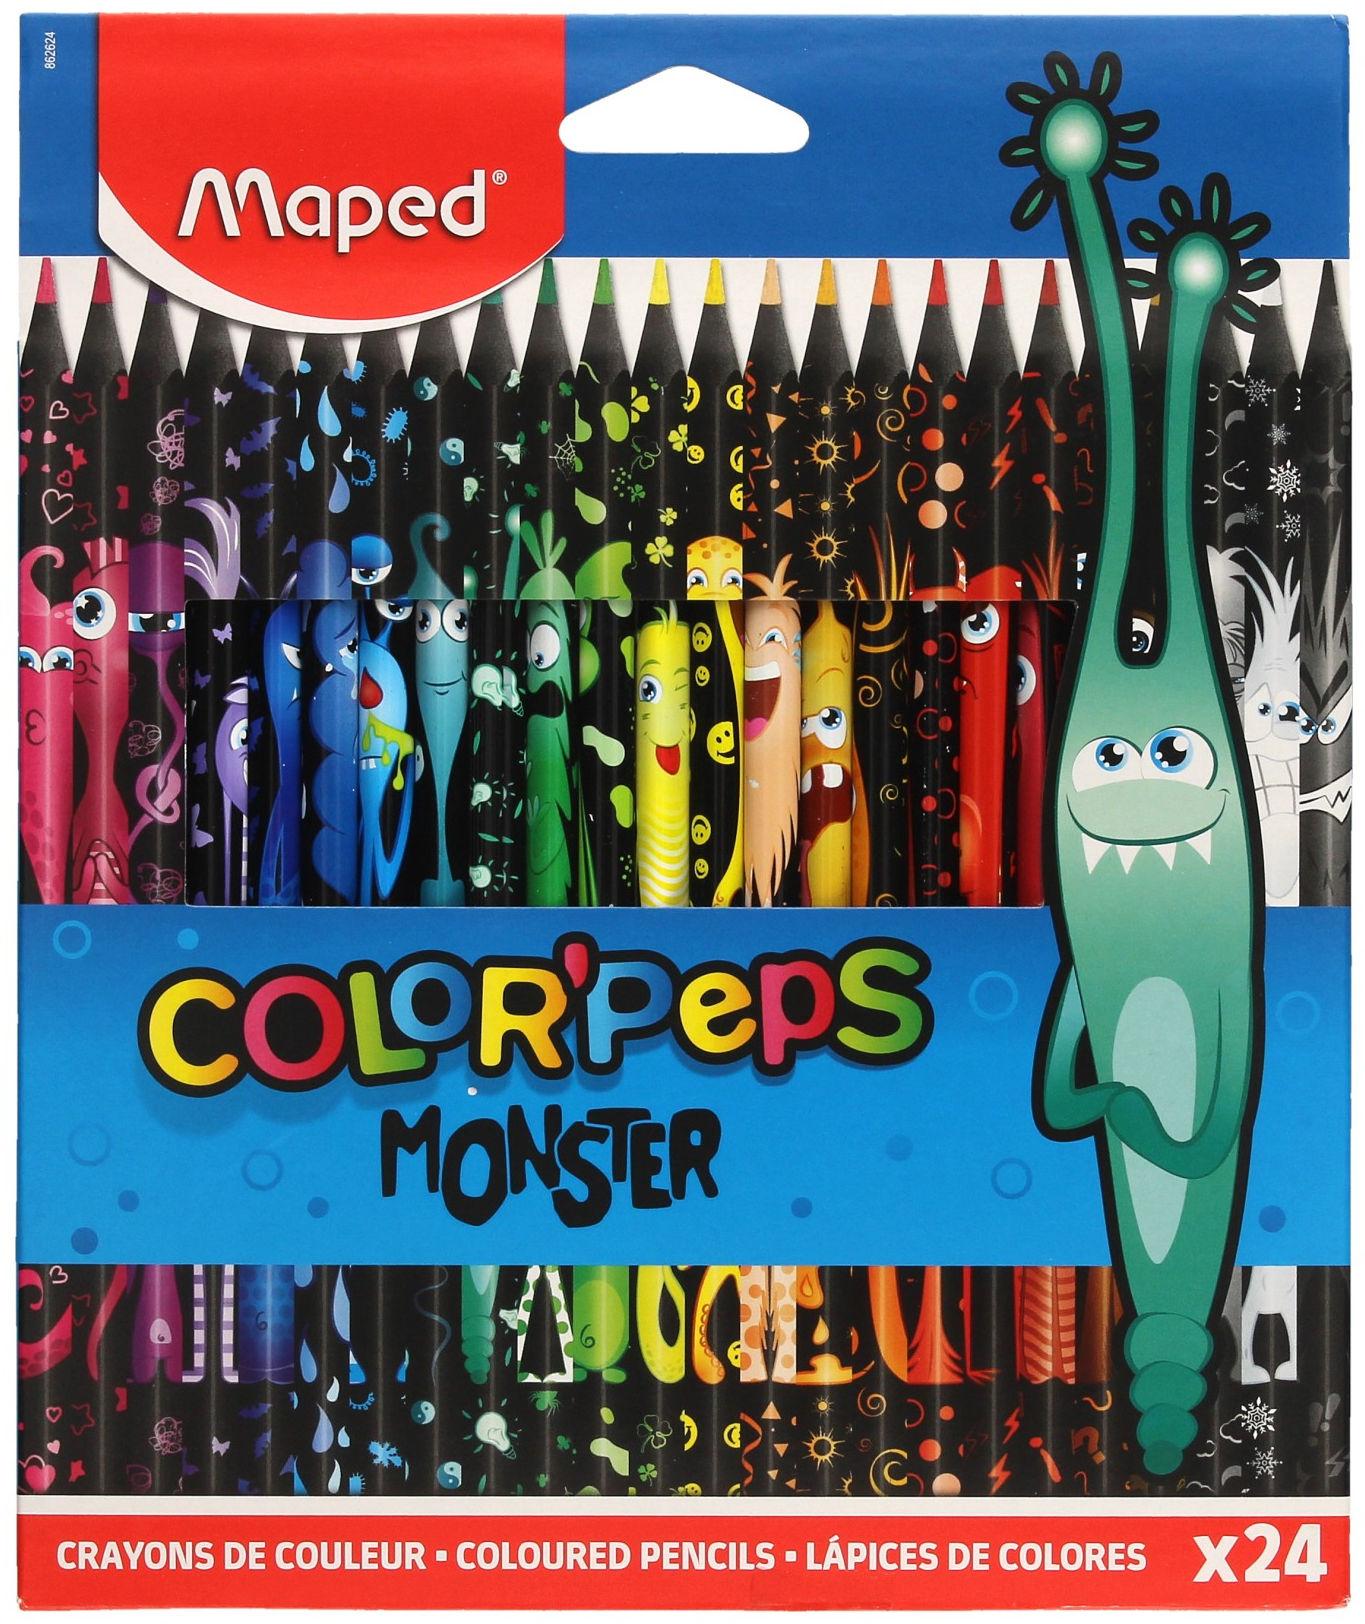 Kredki ołówkowe 24kol Monster Colorpeps Maped 862624